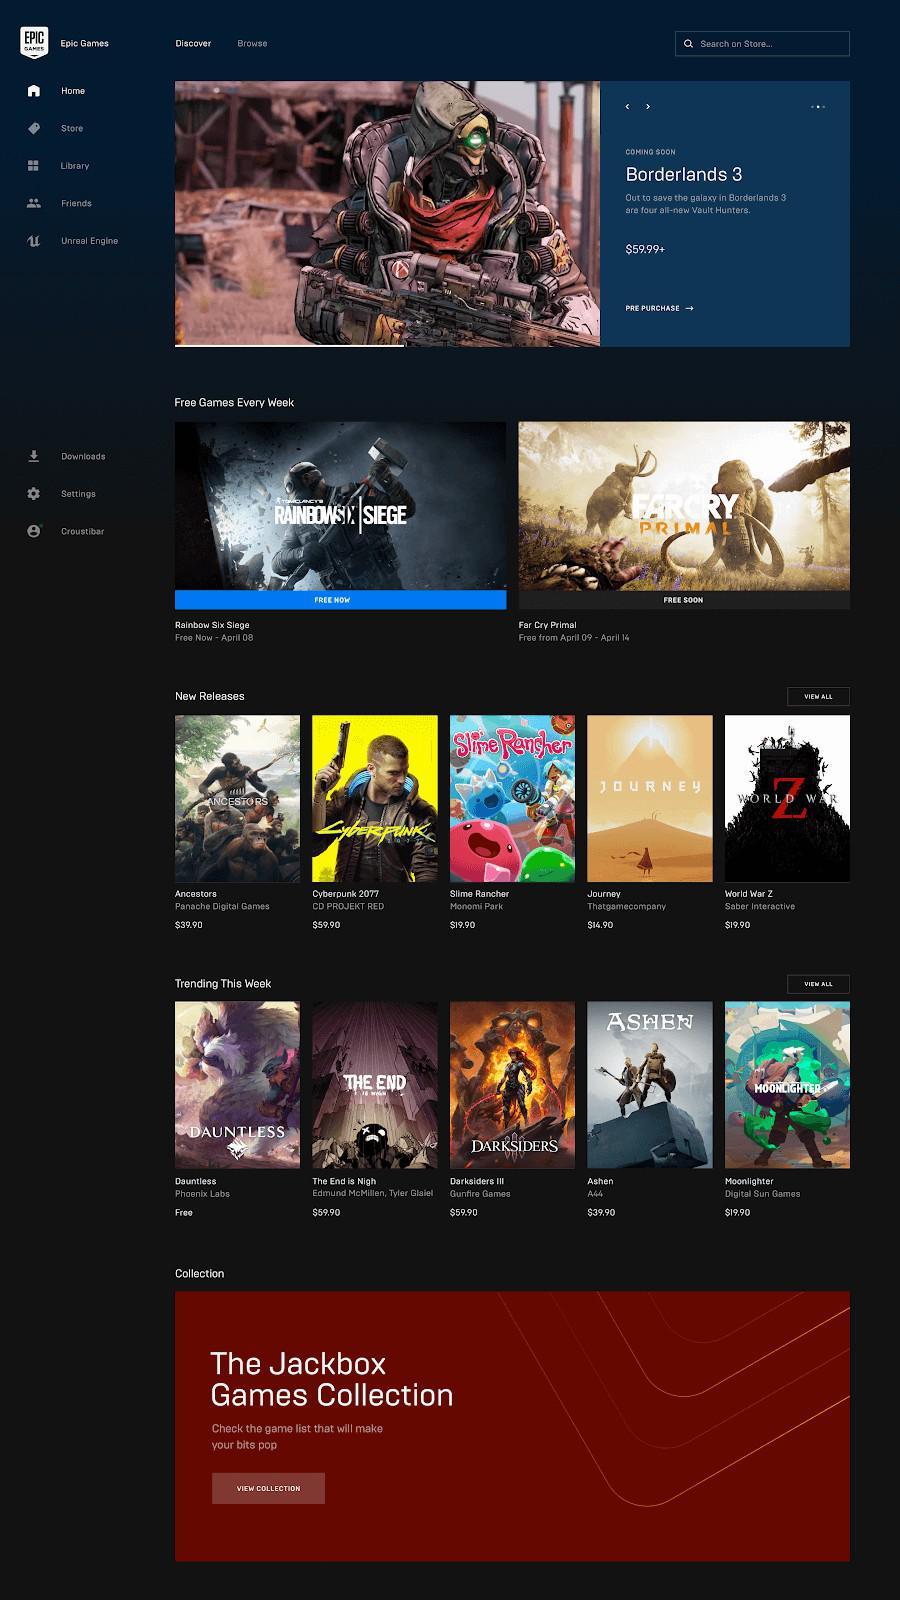 Epic商城功能更新 優化補丁大小和遊戲庫列表檢視   電玩01